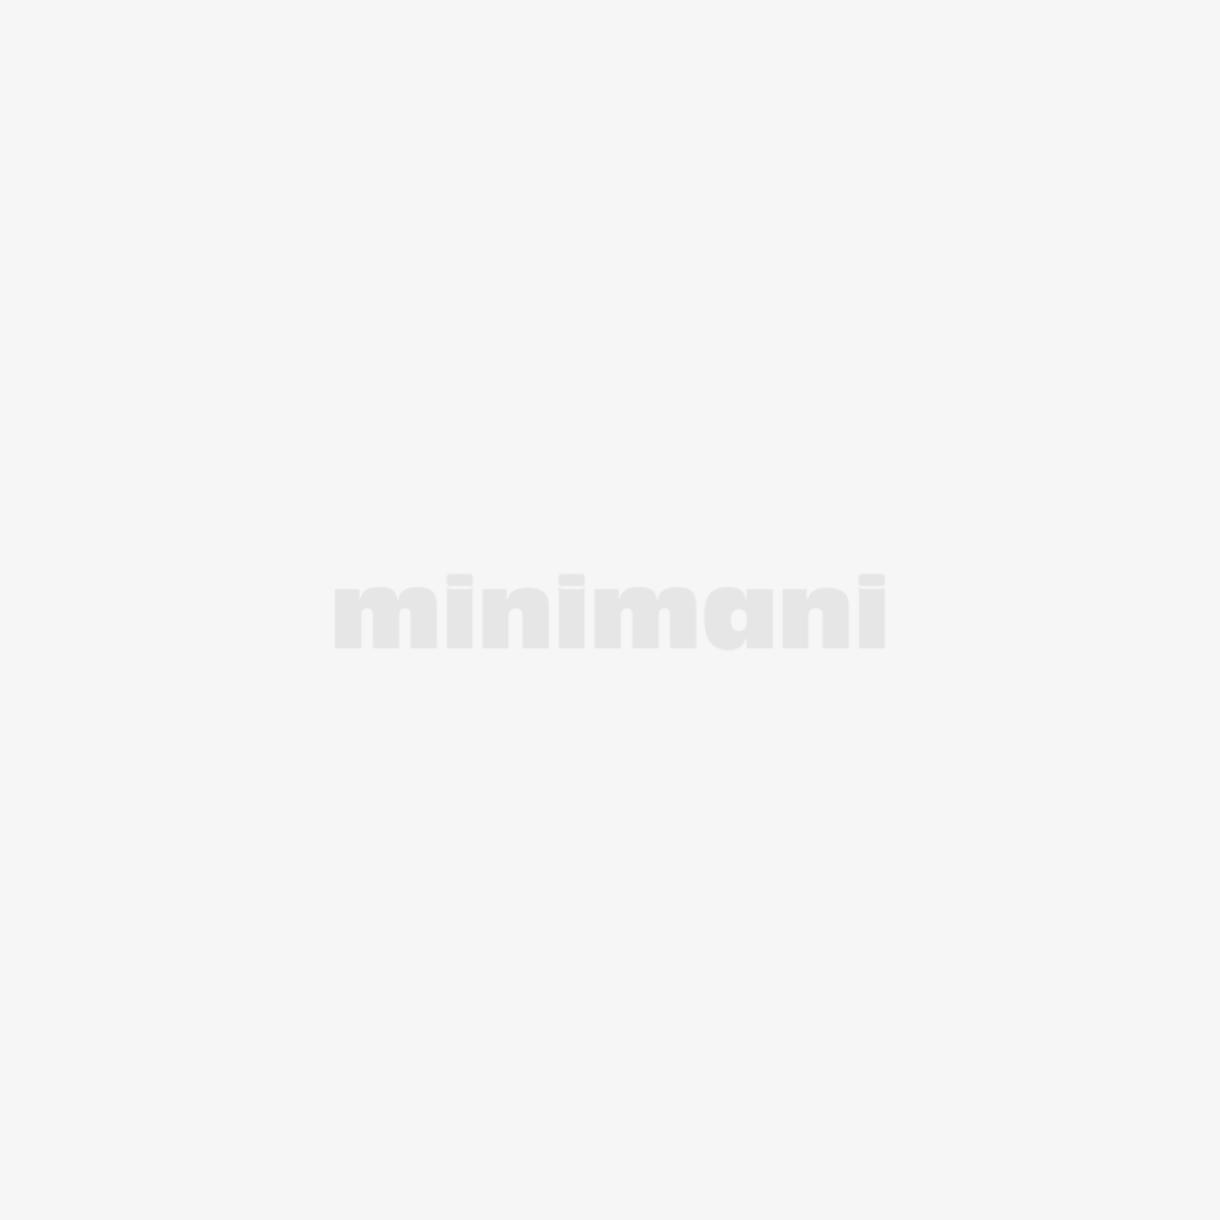 KOHIWOOD LIIMAPUULEVY 800X600X18MM